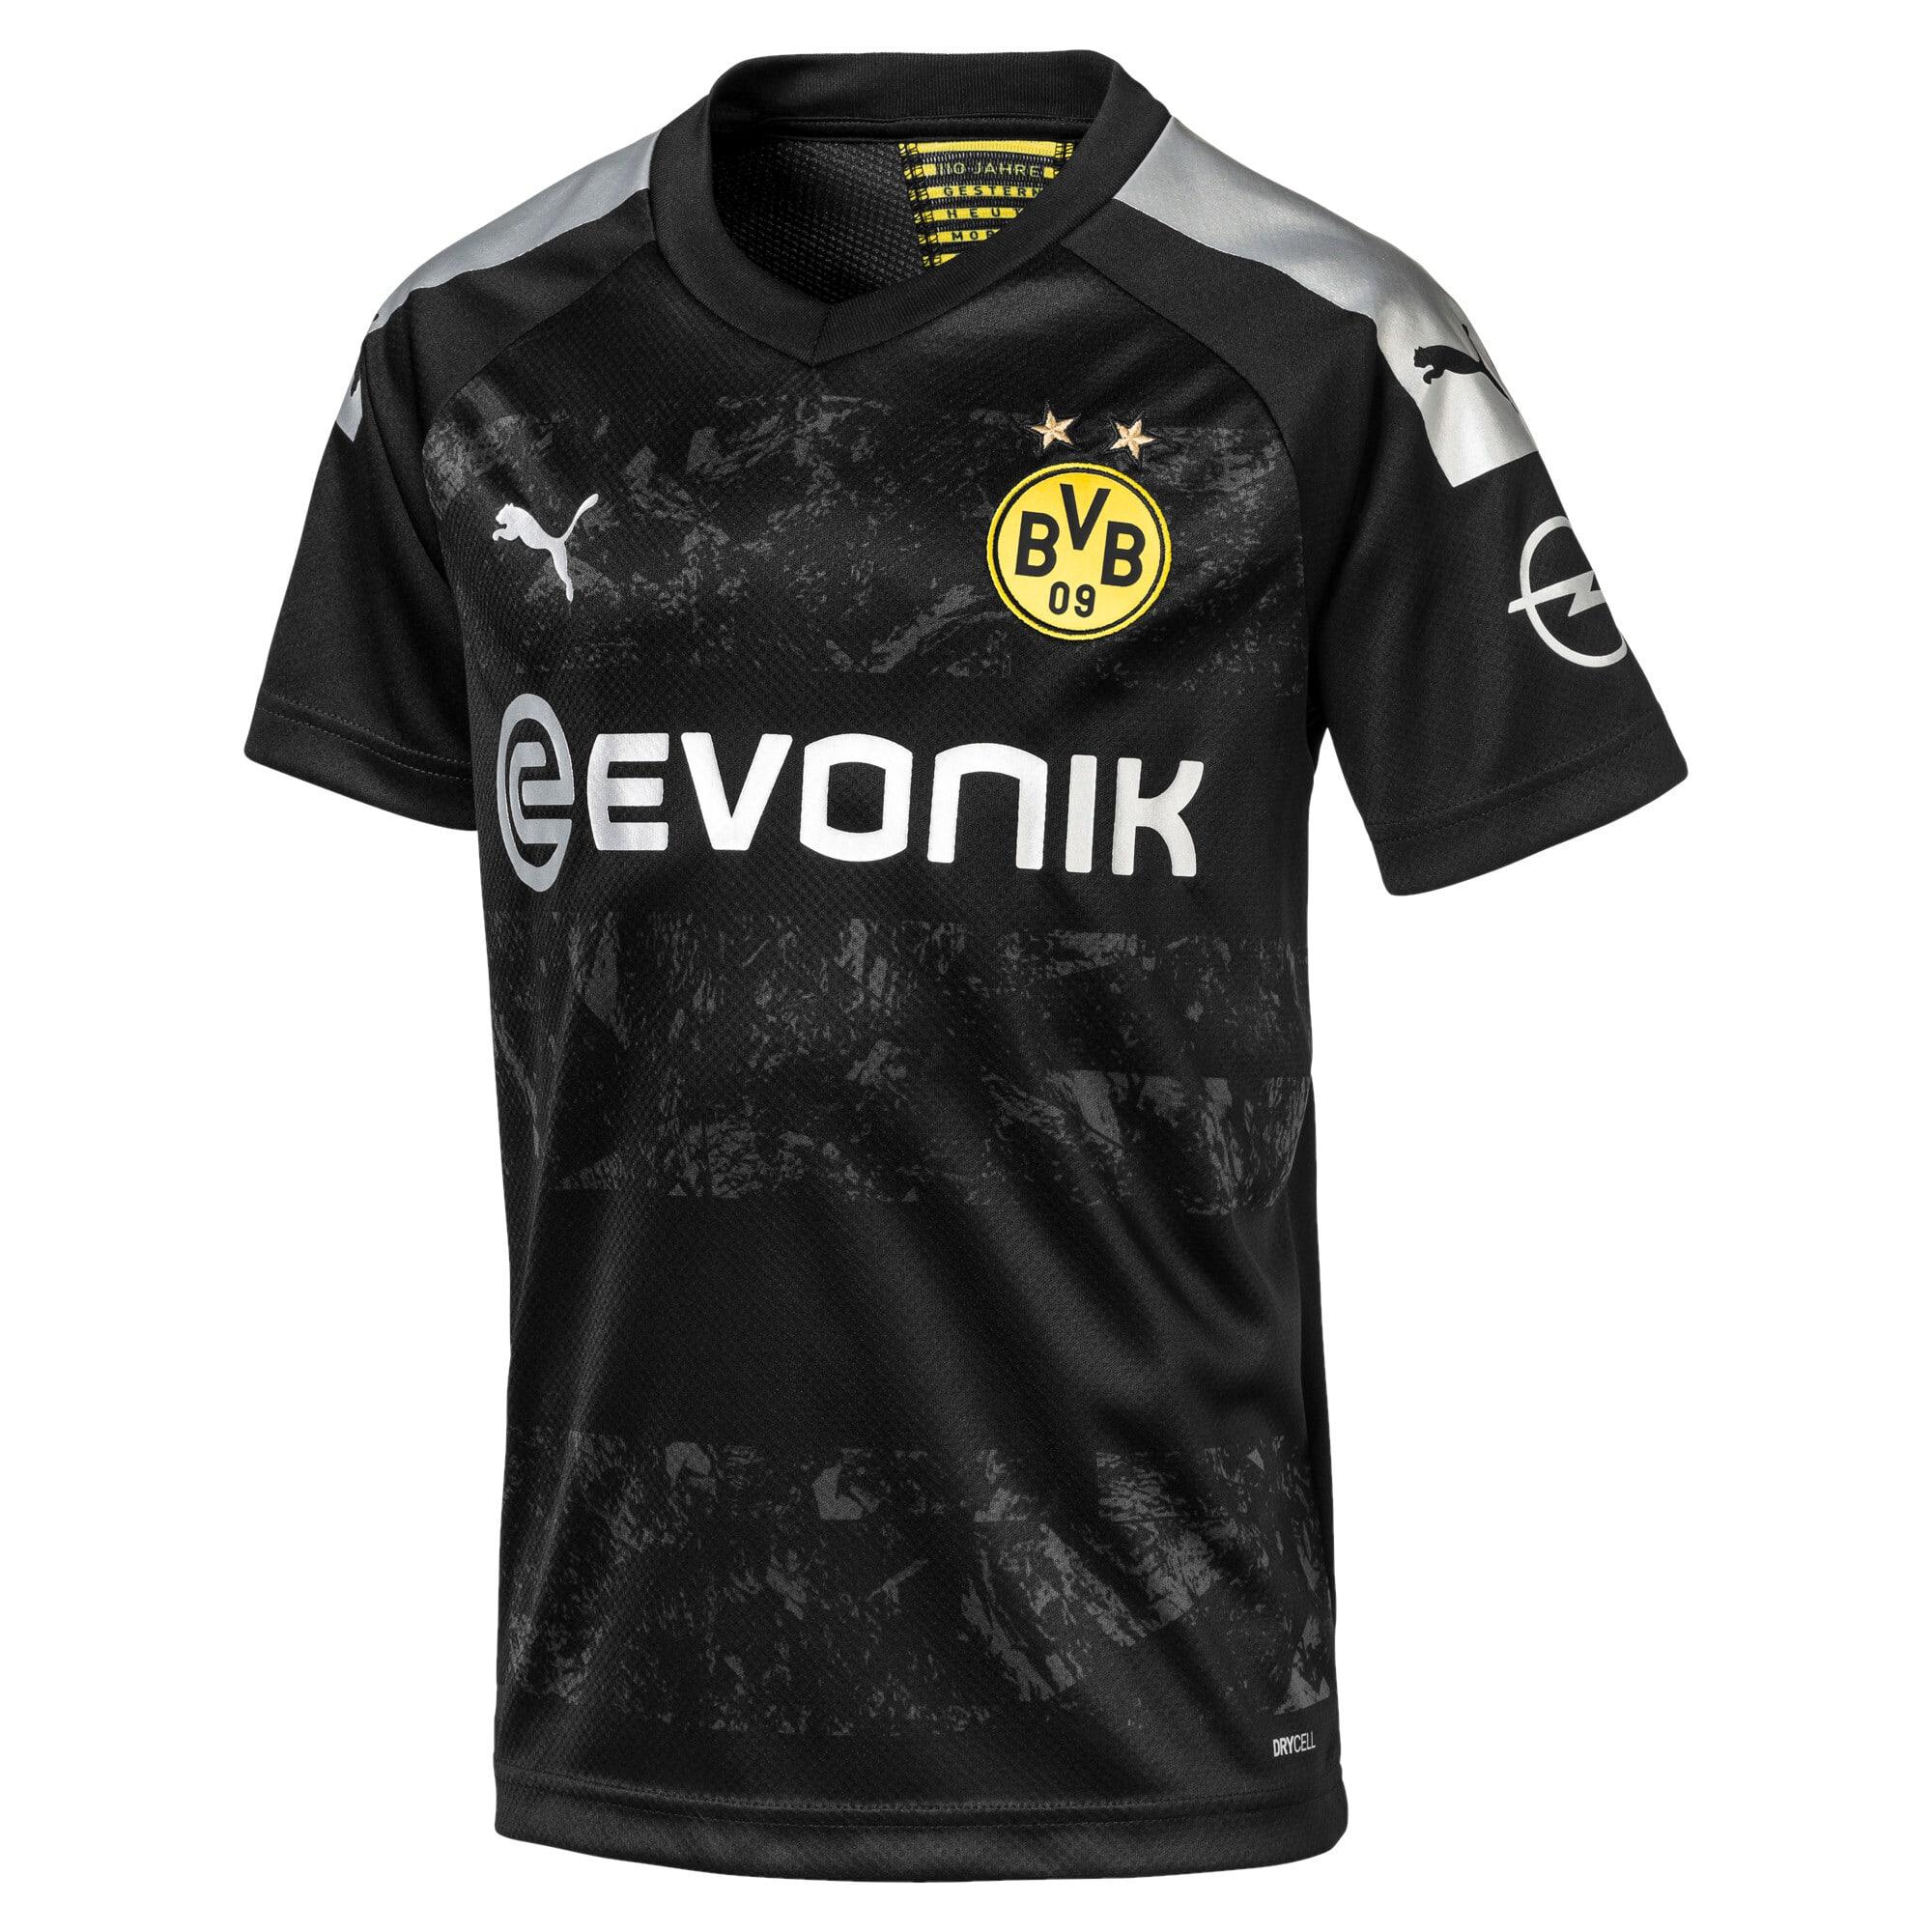 Thumbnail 1 of BVB Boys' Away Replica Jersey, Puma Black, medium